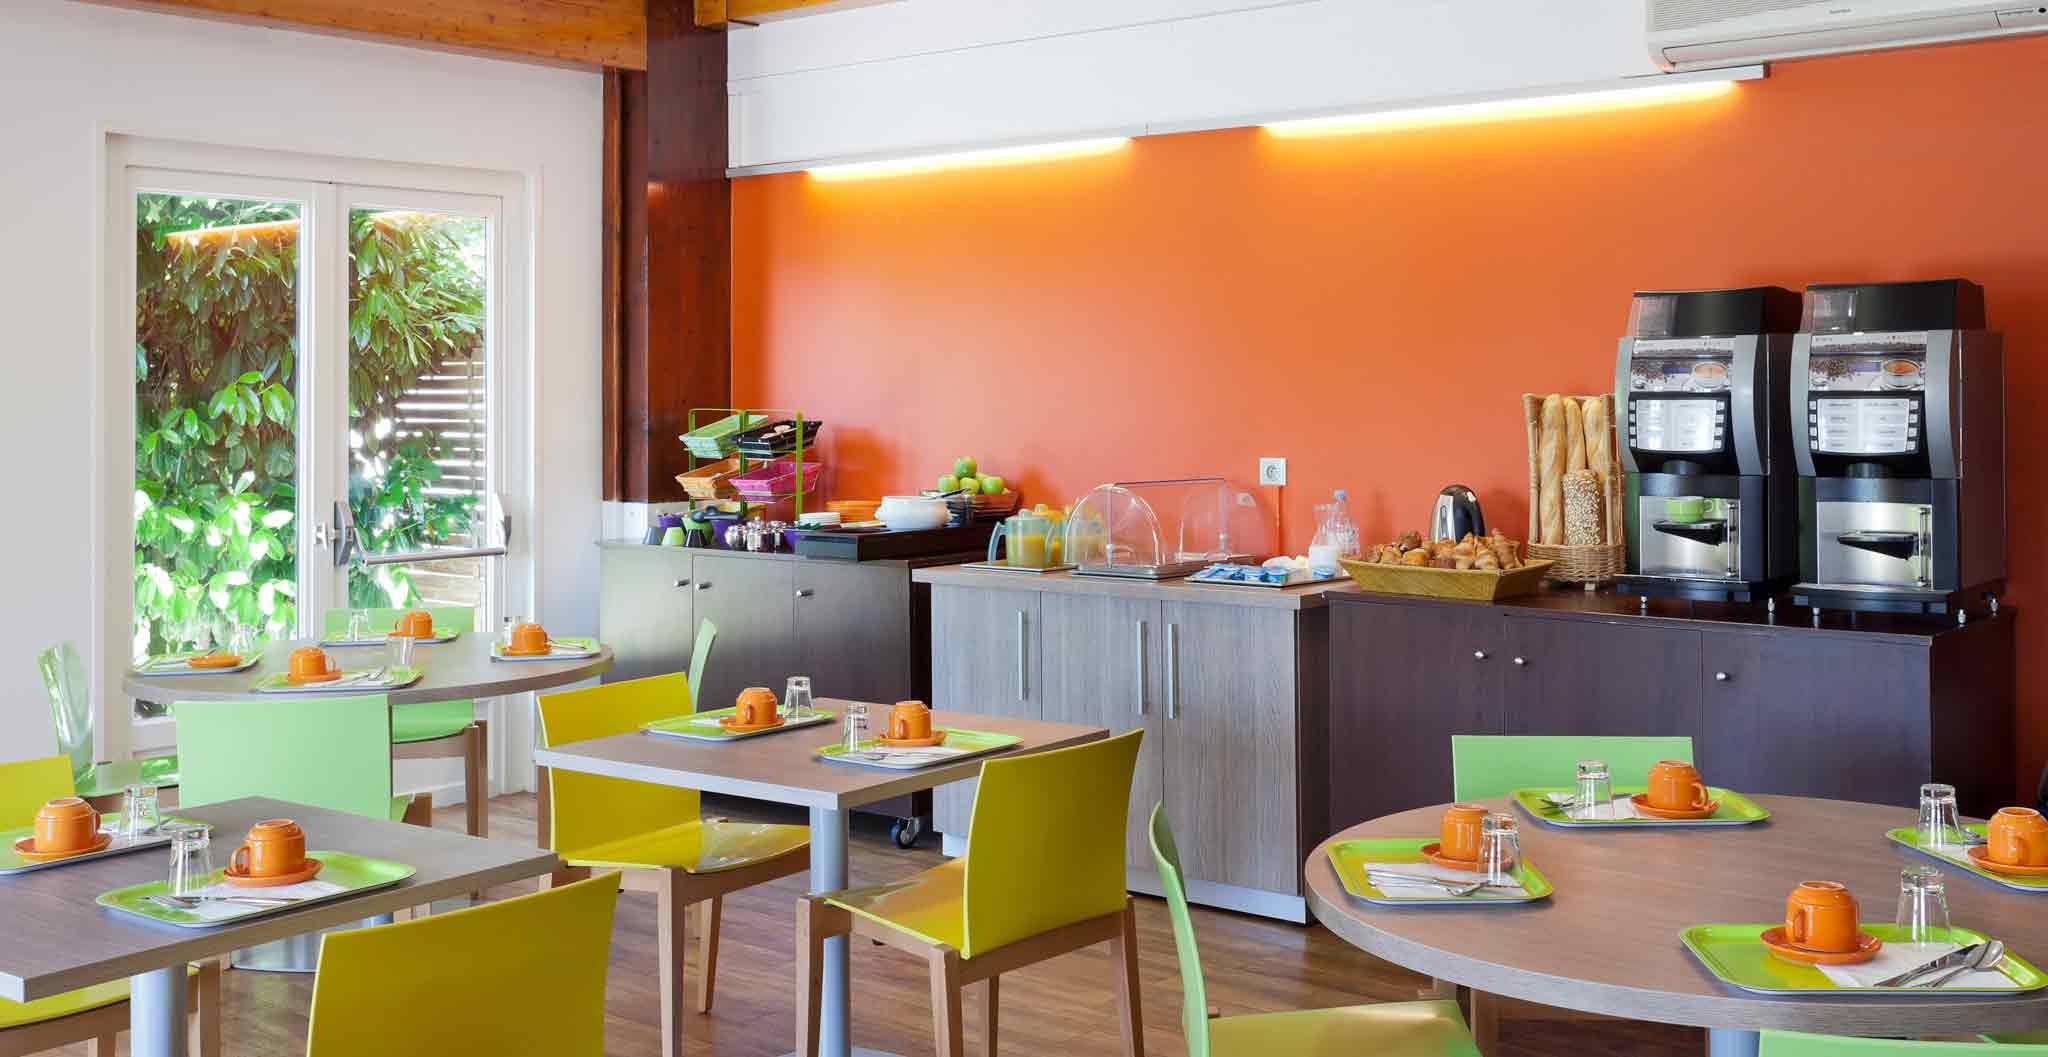 ibis Styles Perigueux Trelissac Gastronomie